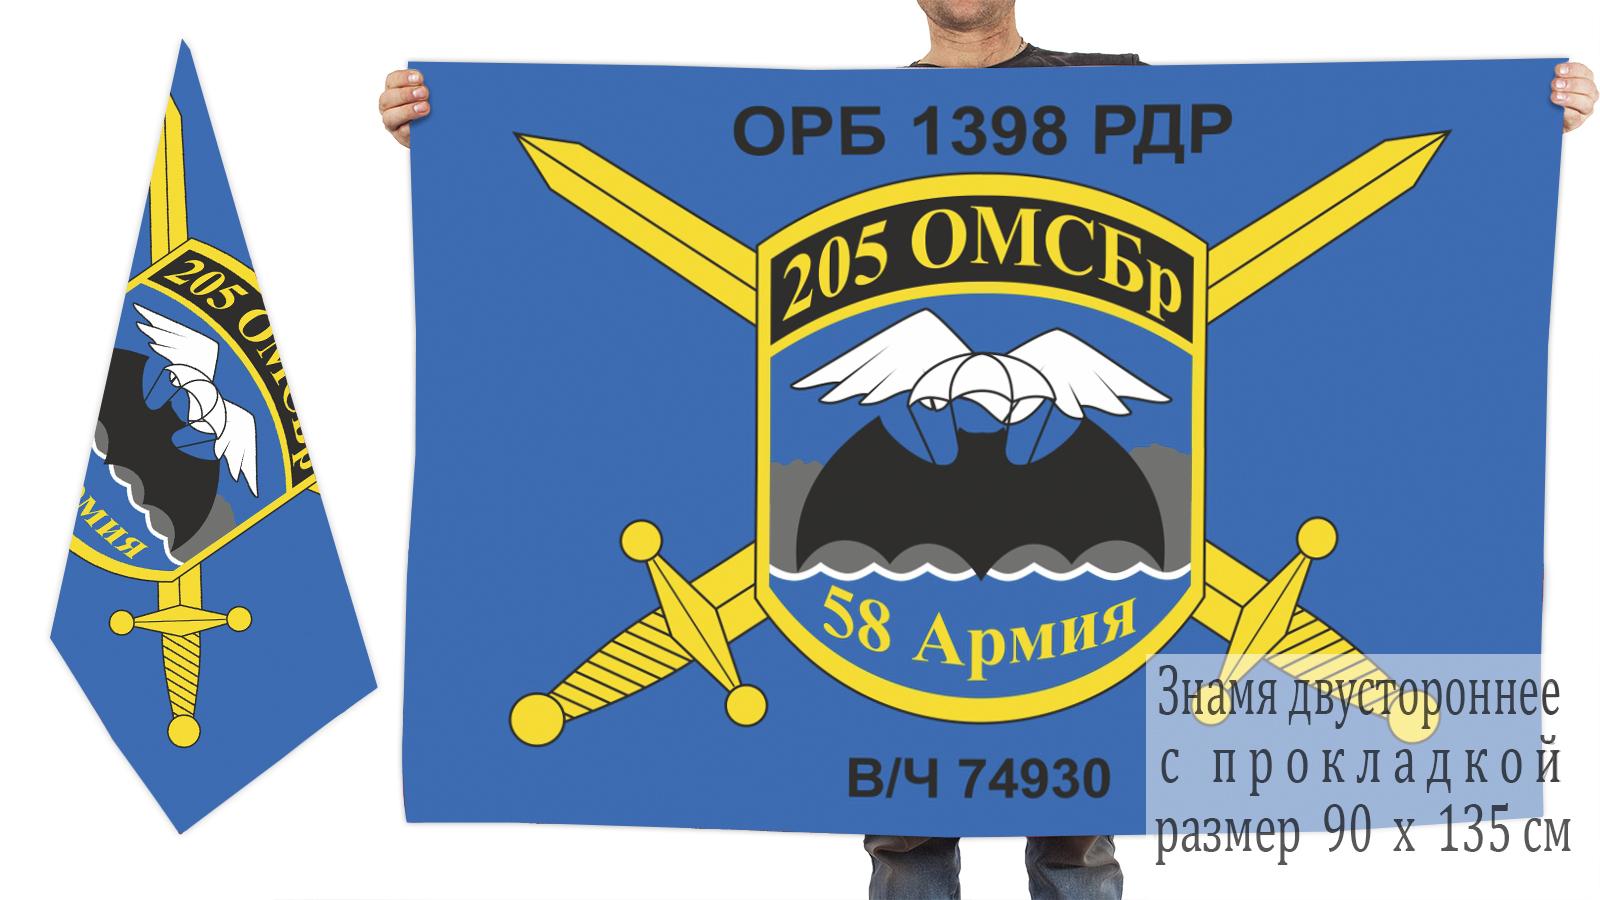 Двусторонний флаг ОРБ 1398 РБР 205 ОМСБр 58 Армии